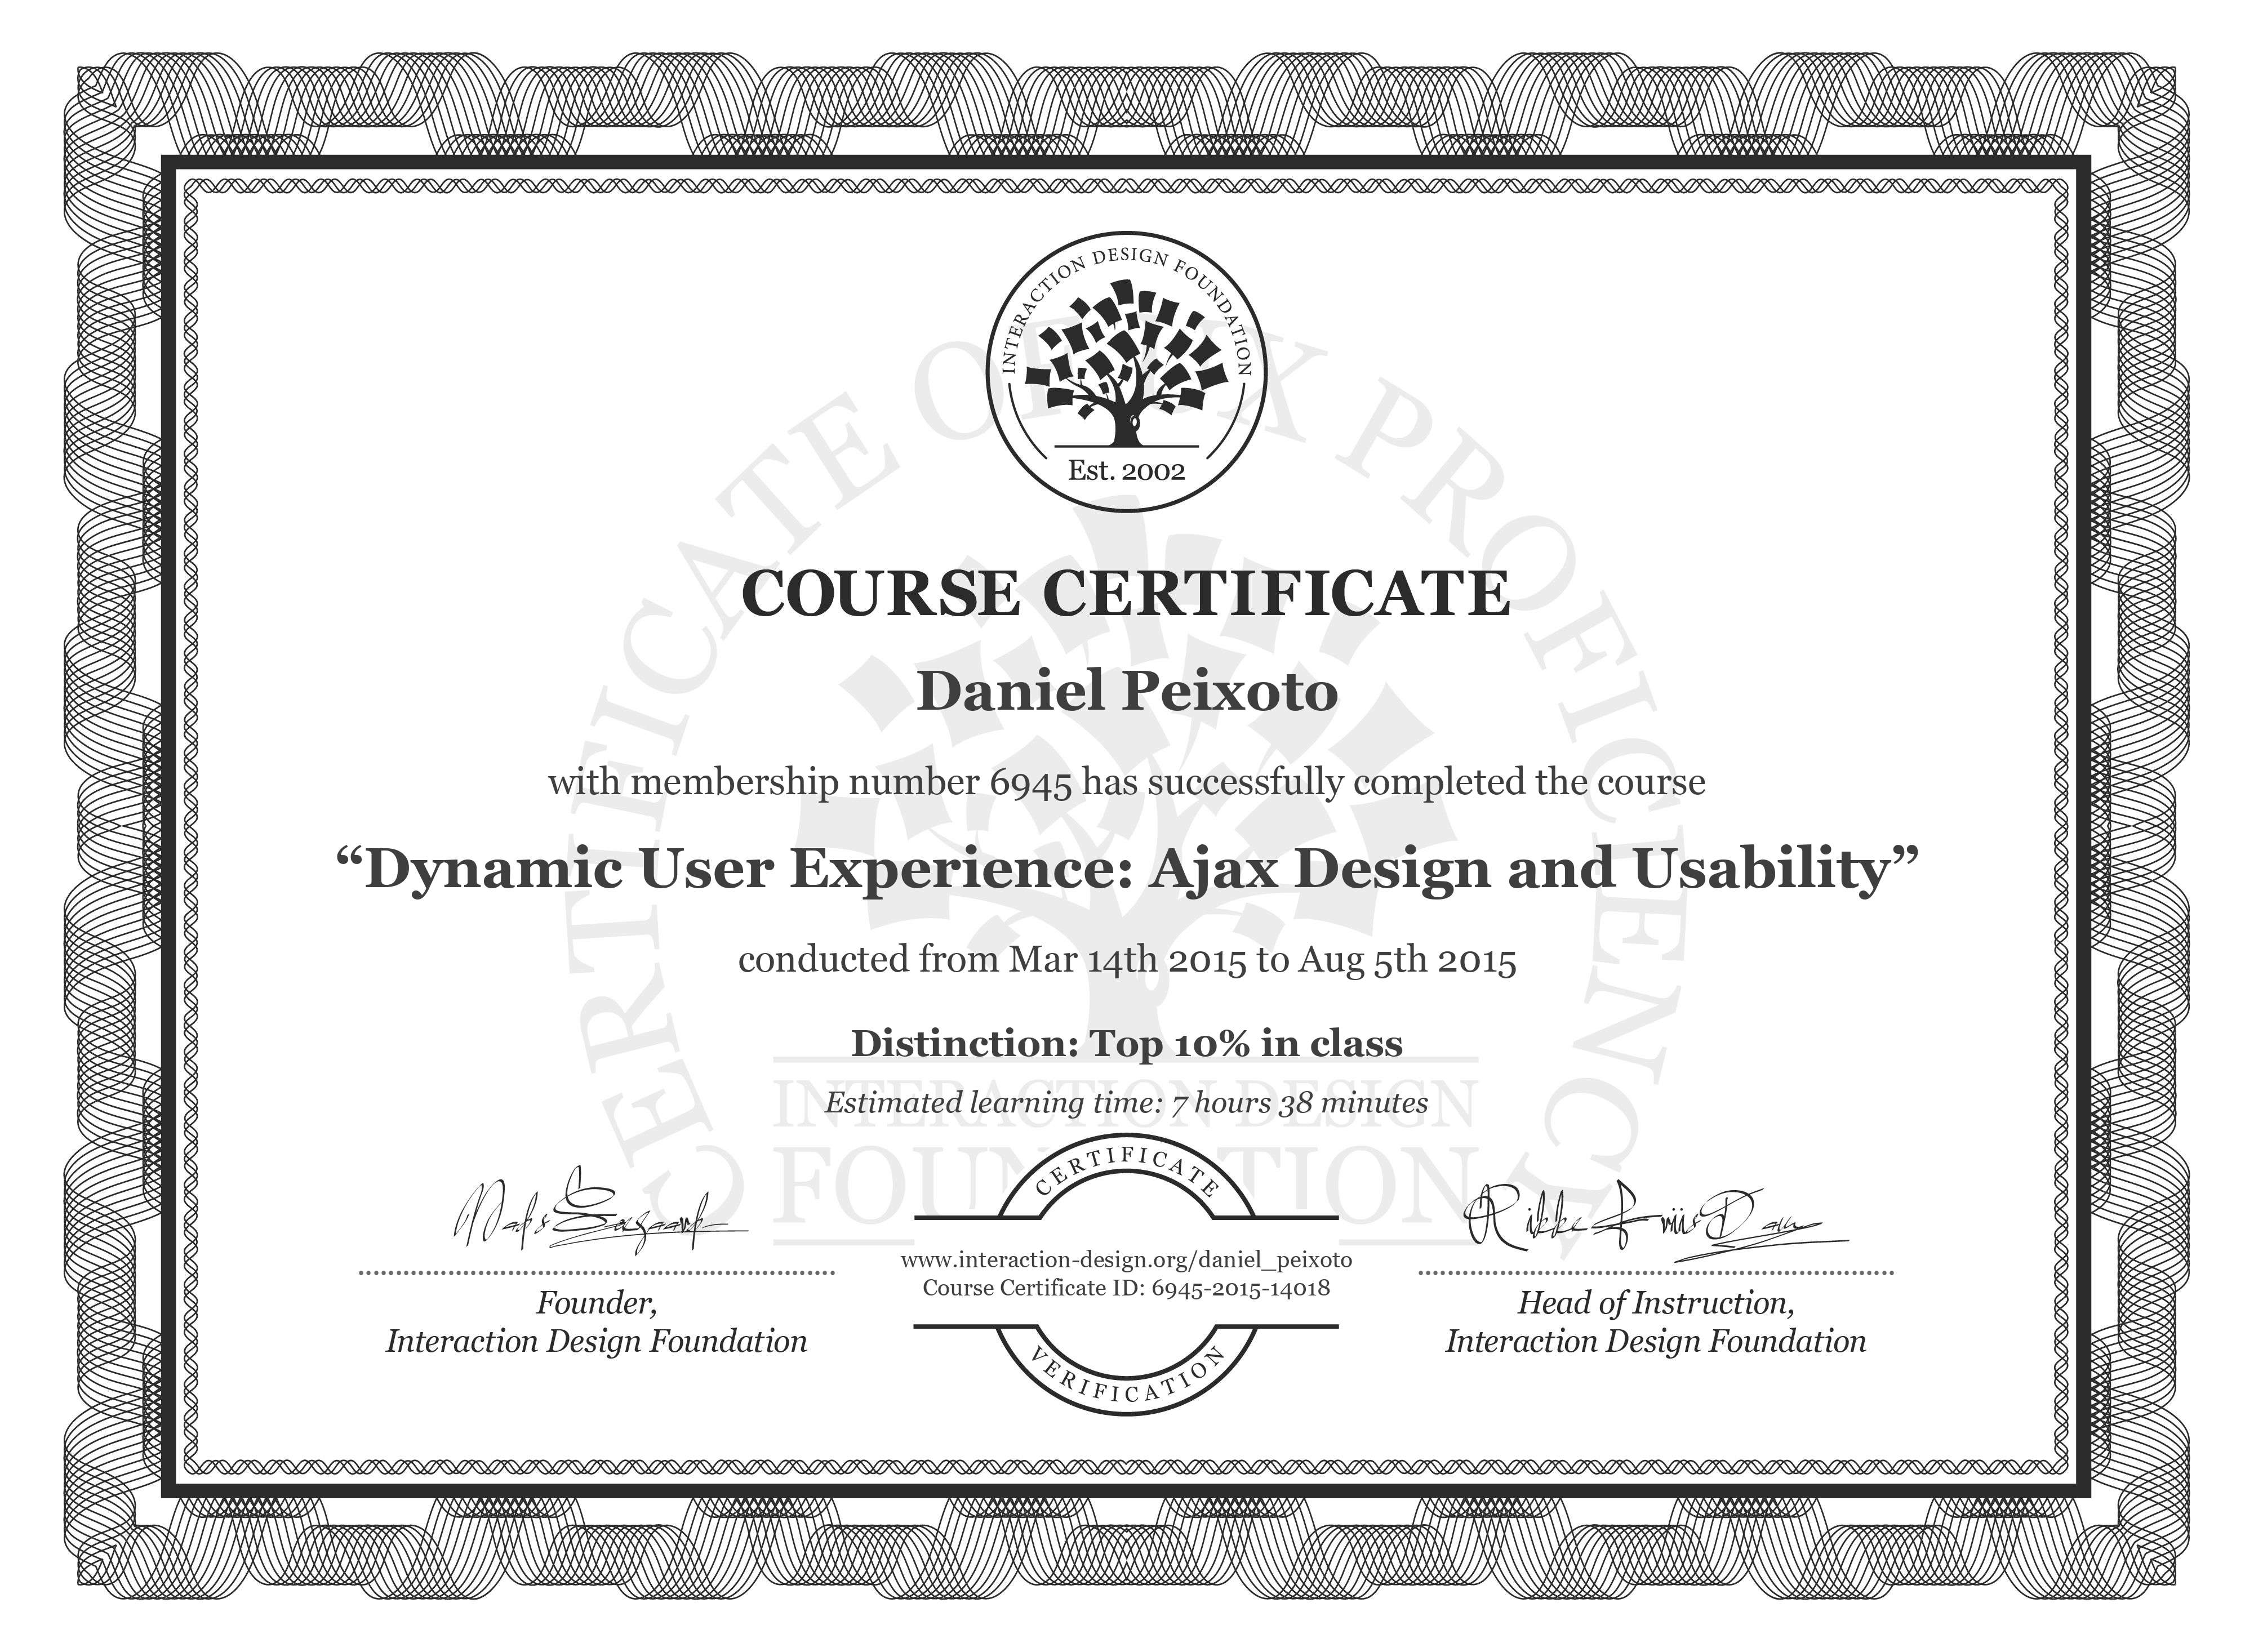 Daniel Peixoto: Course Certificate - Dynamic User Experience: Ajax Design and Usability